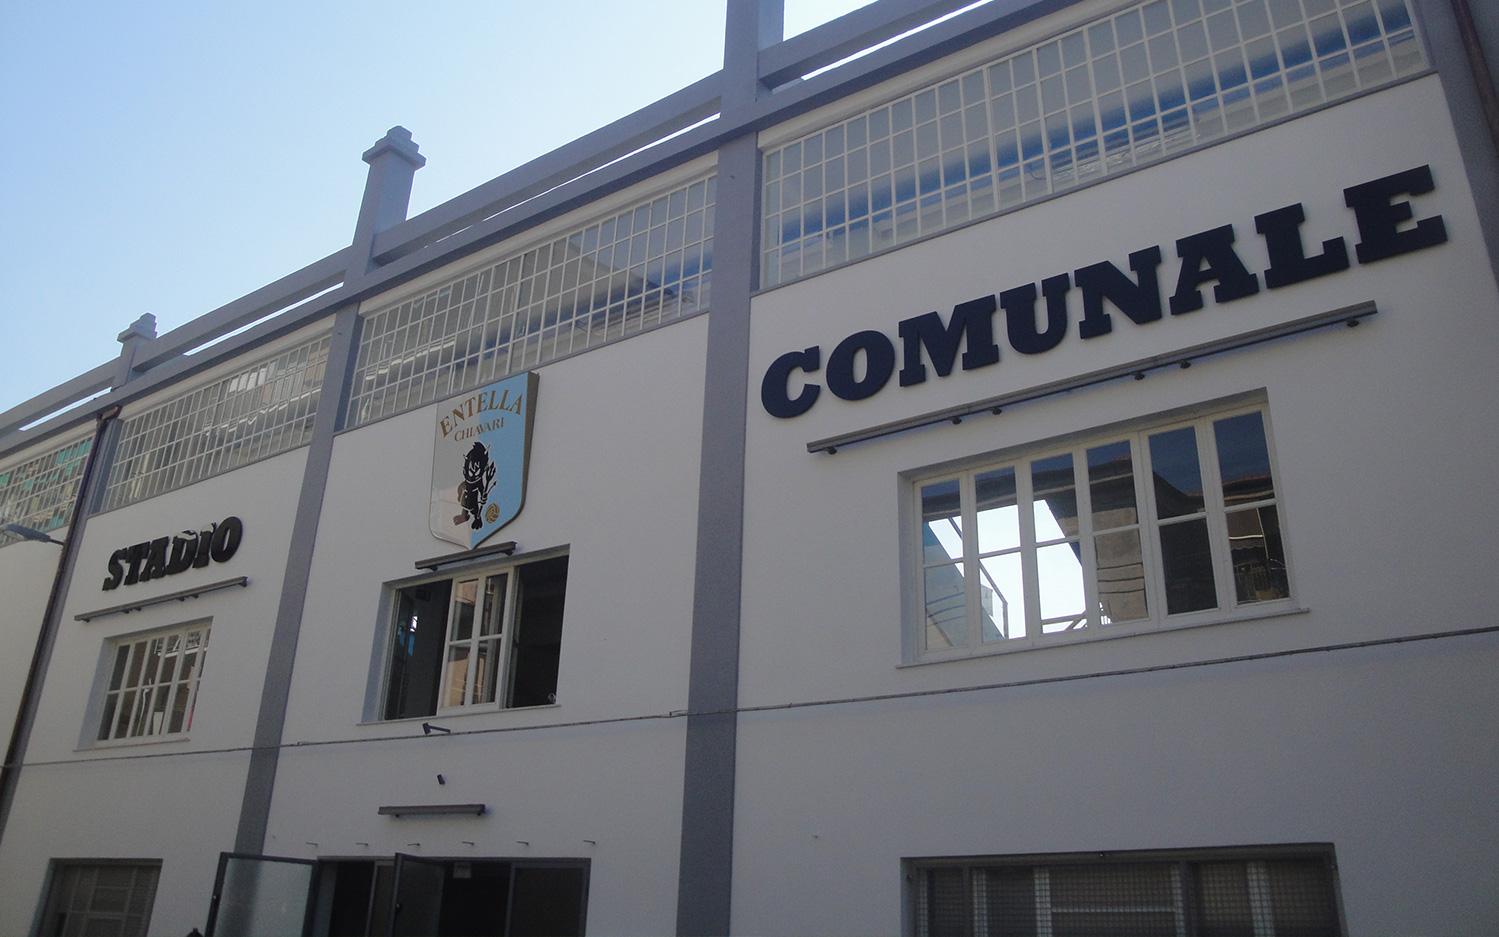 Stadio Comunale Chiavari - Virtus Entella Chiavari